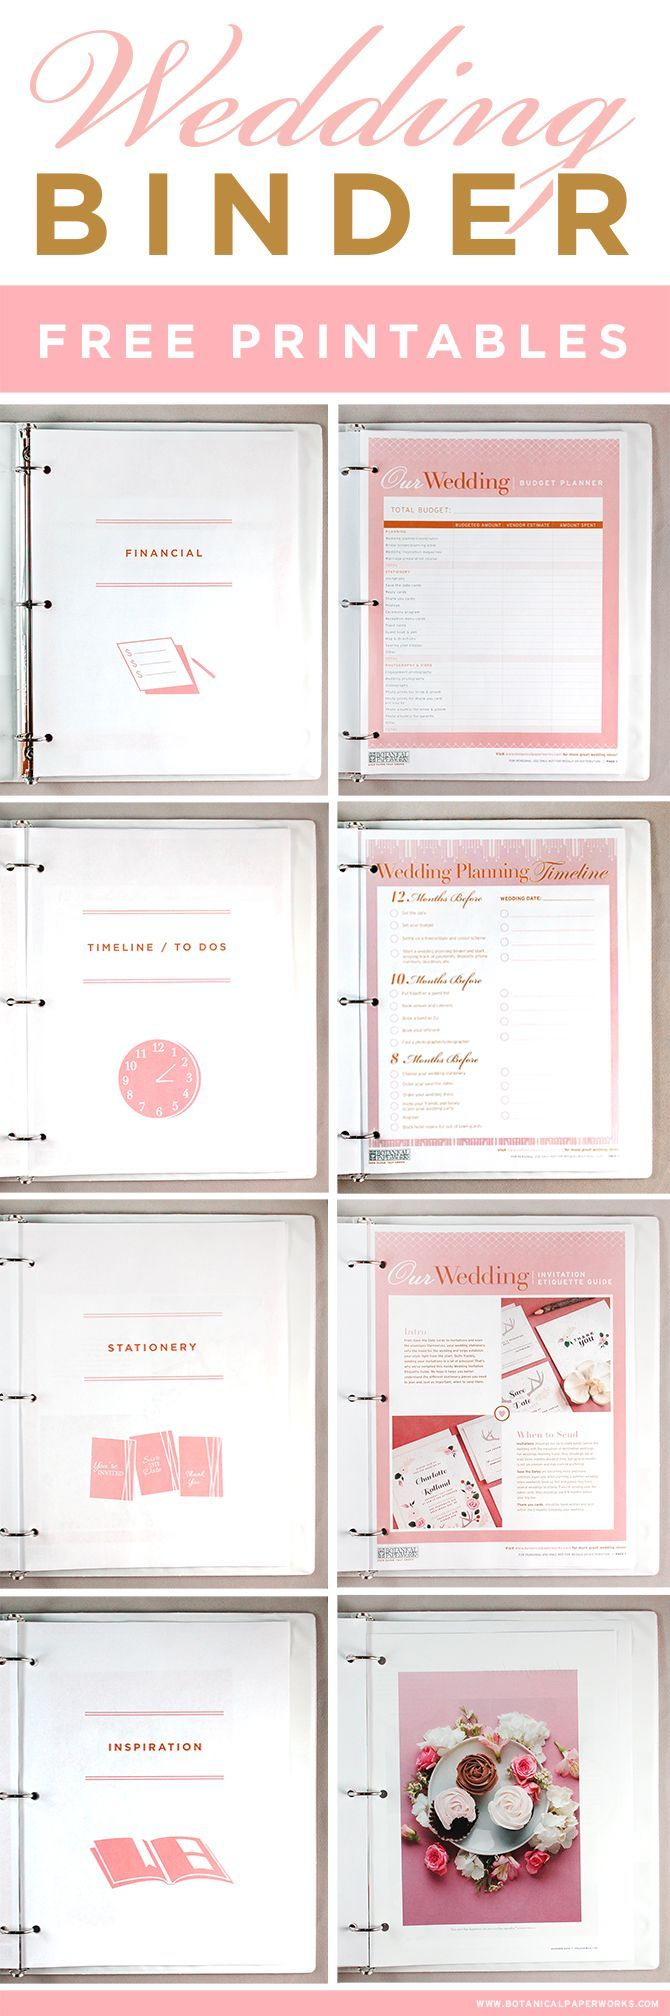 Gorgeous Wedding Book Planner Free Free Printable Wedding Planner - Free Printable Wedding Planner Book